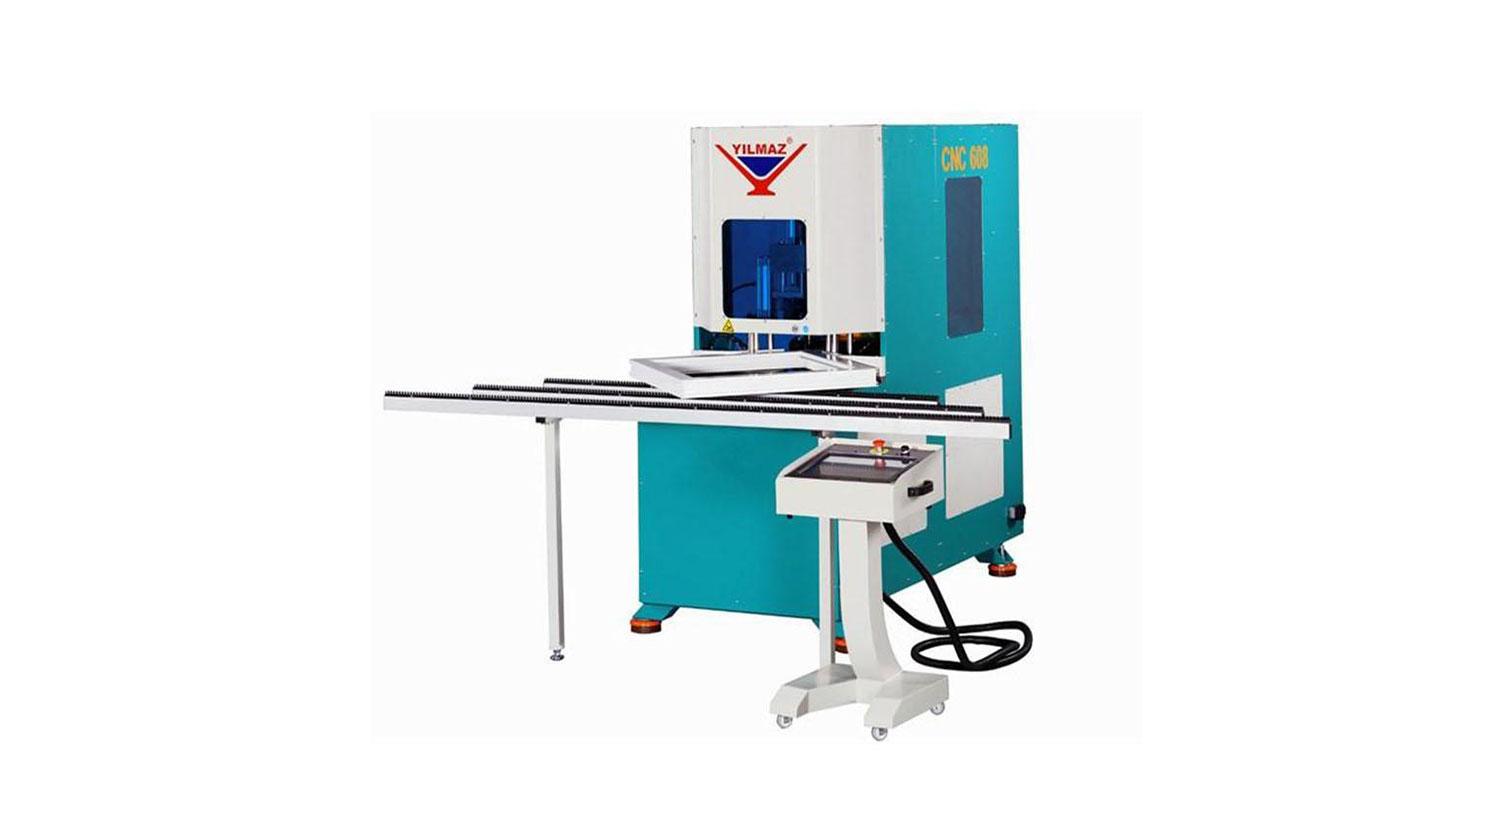 INT pvc corner cleaner Yilmaz CNC 608